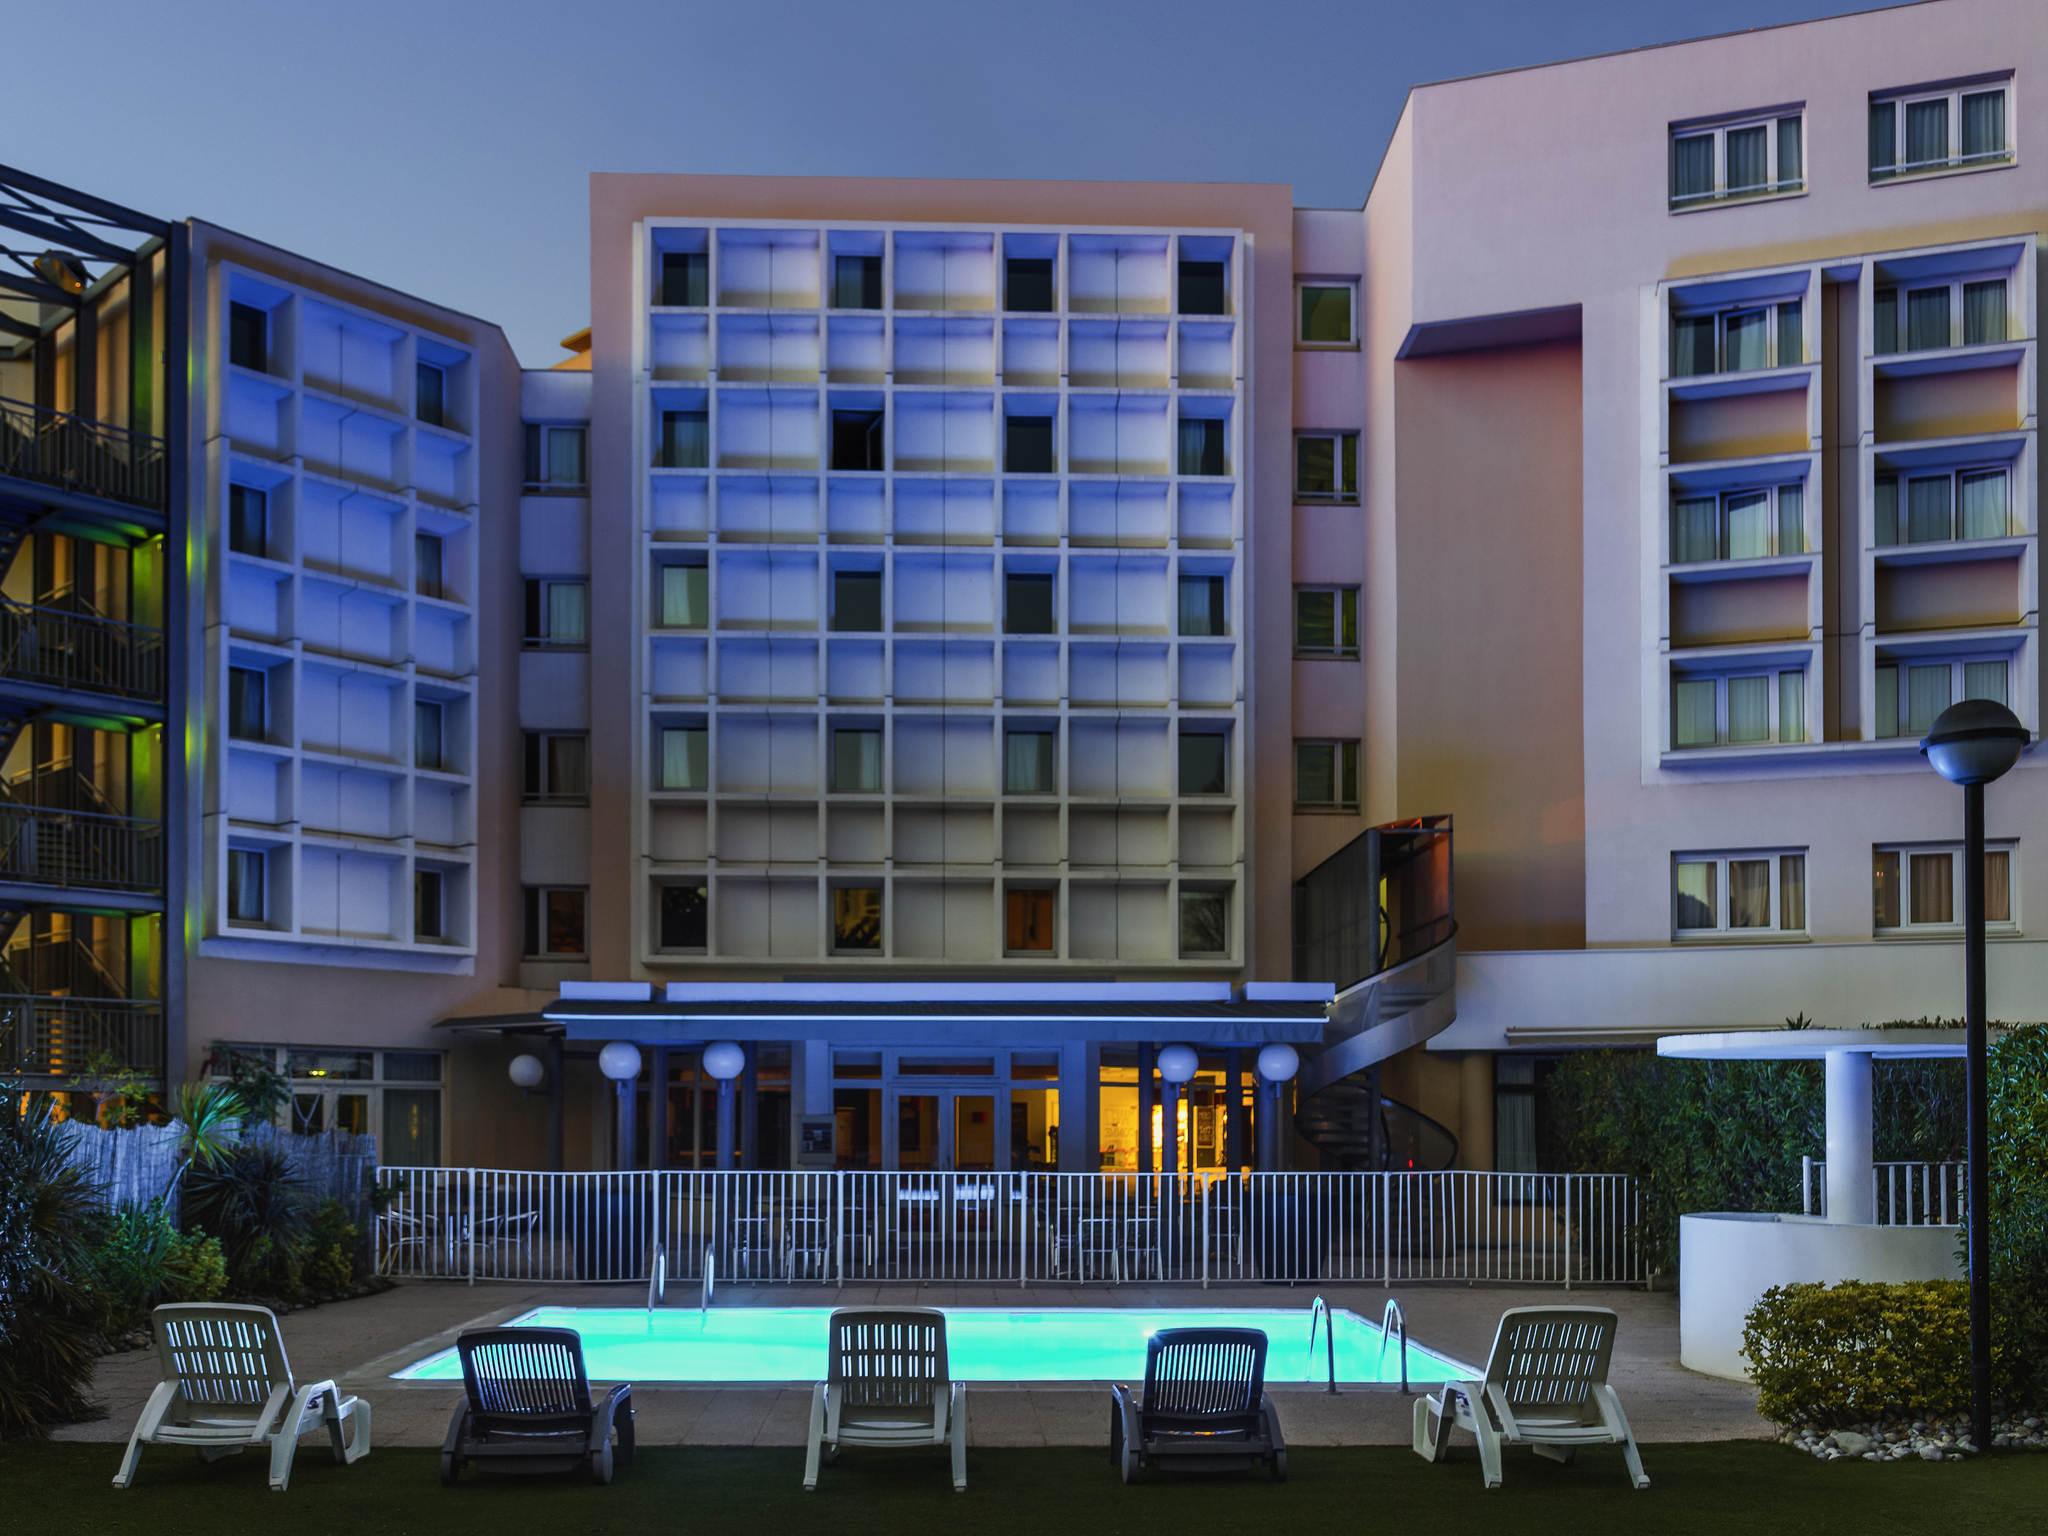 酒店 – 宜必思马赛 Bonneveine Route des Calanques 酒店